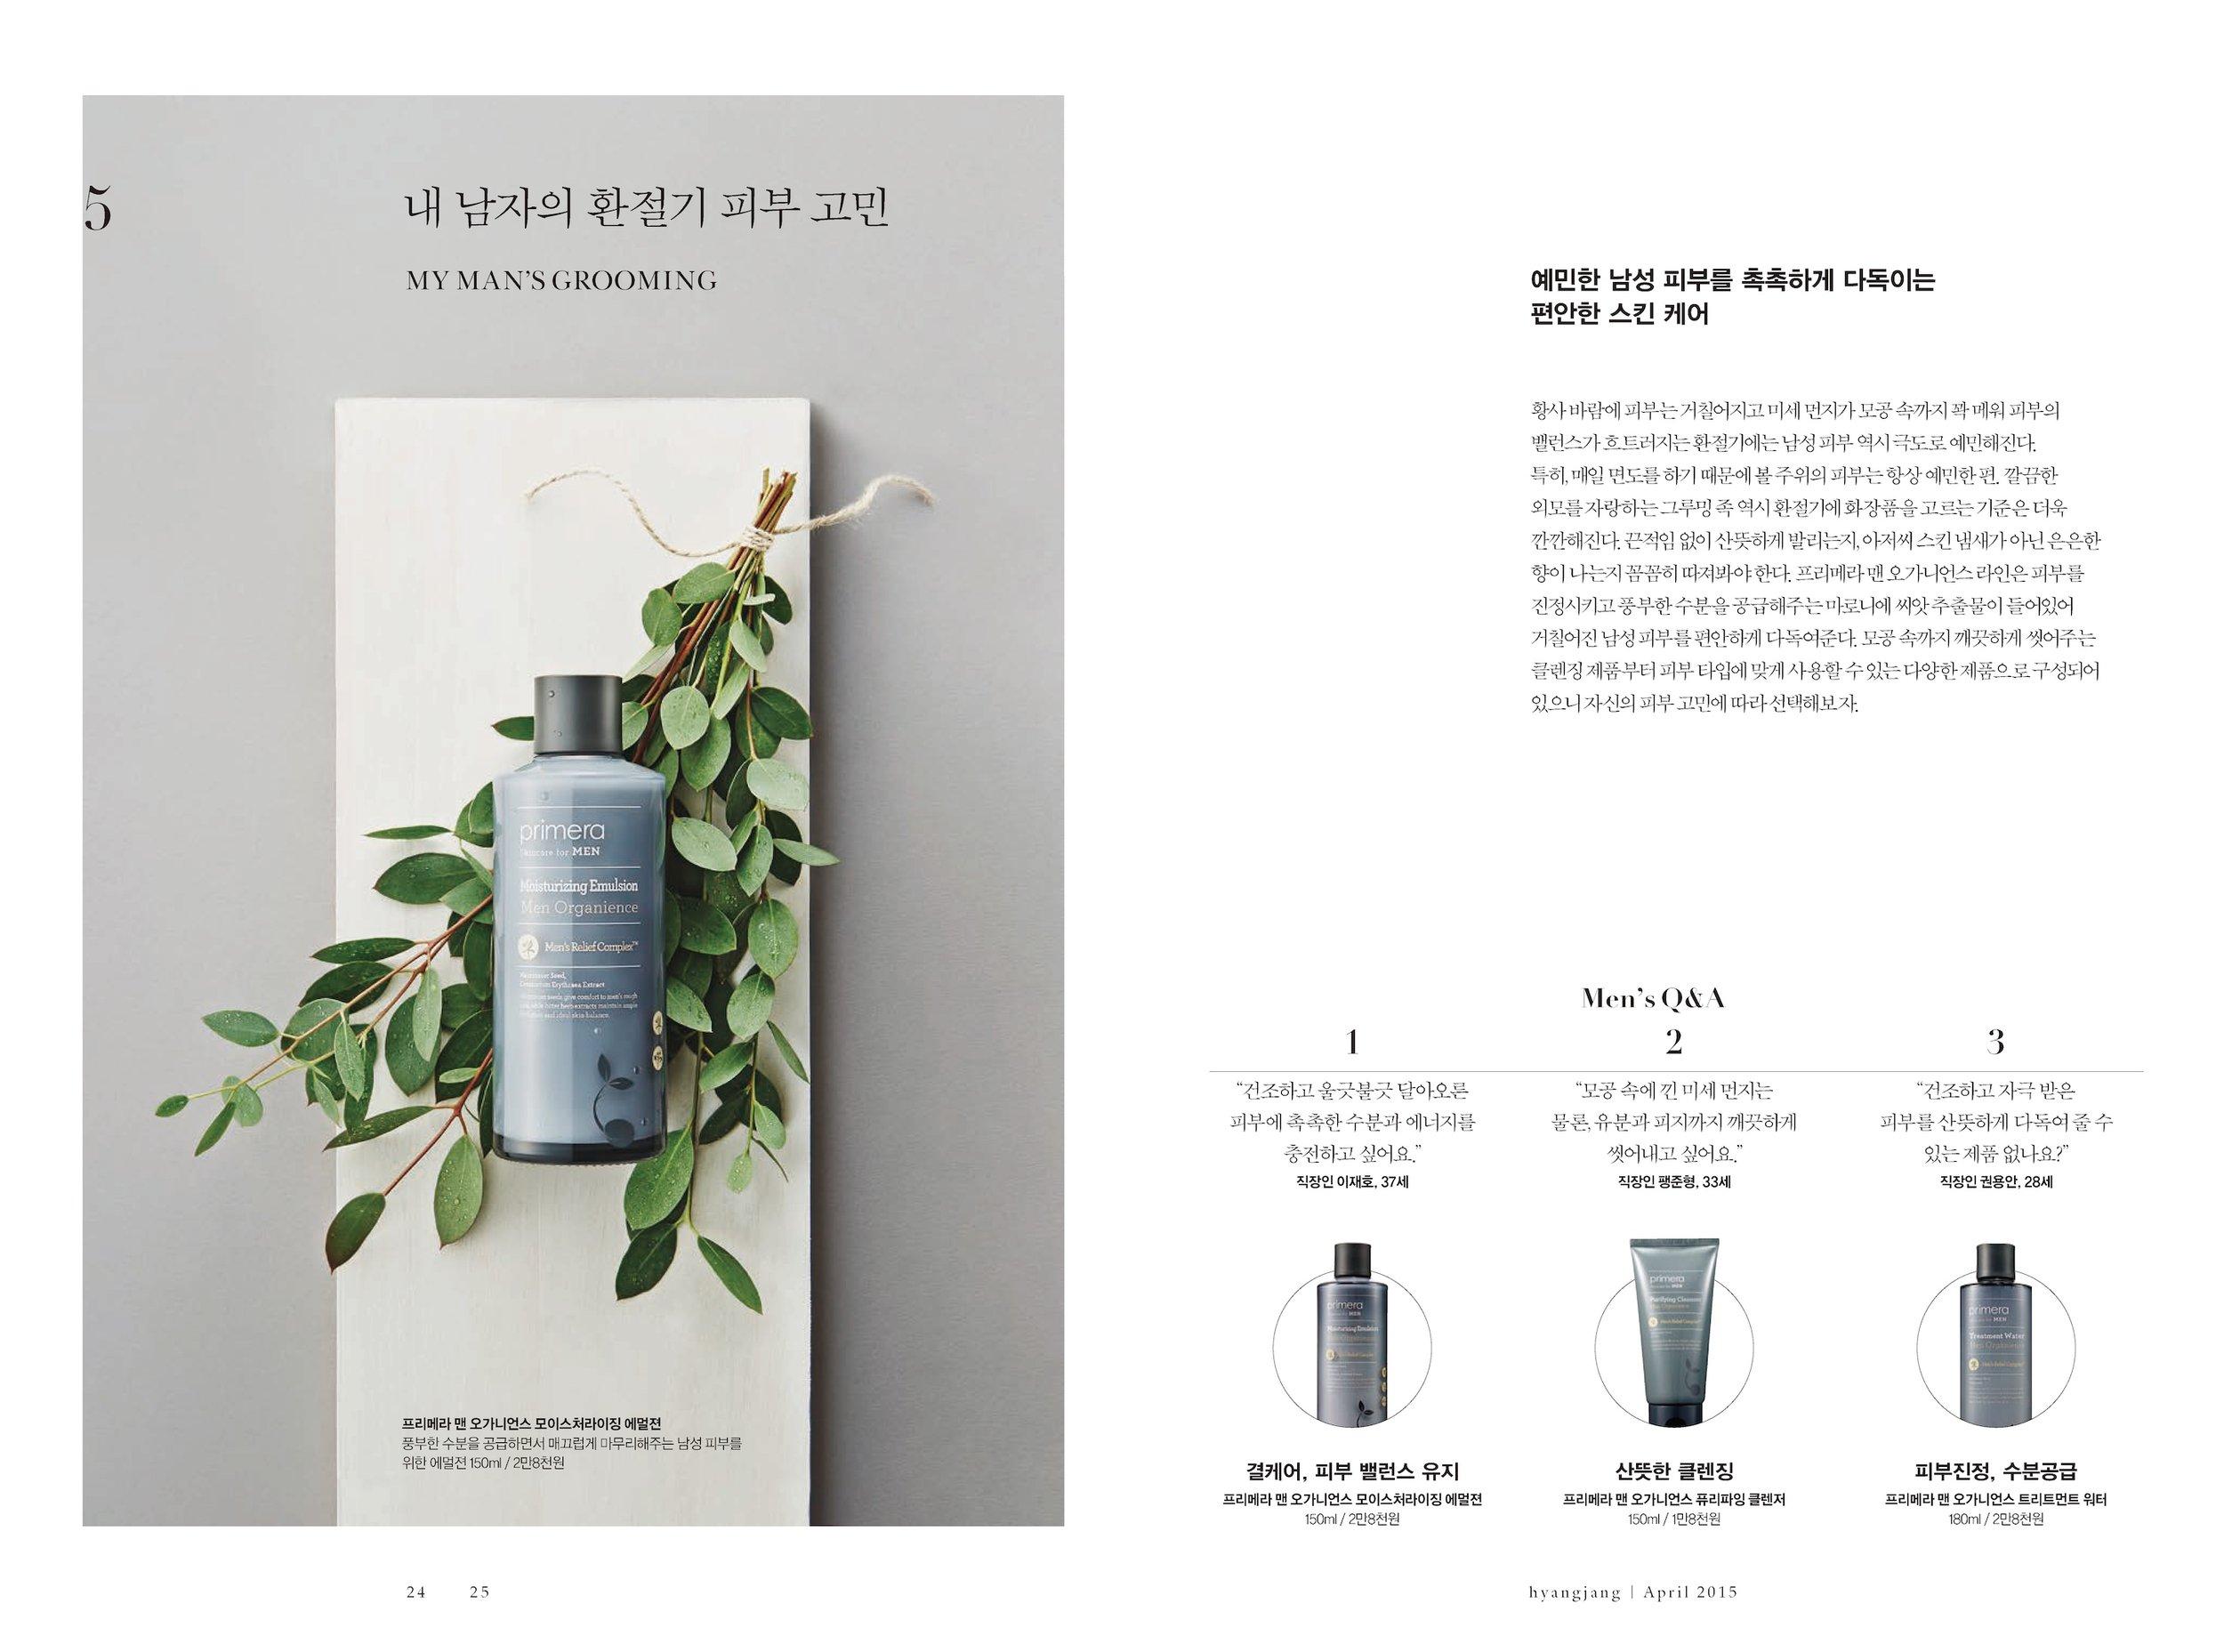 hyangjang-201504_페이지_13.jpeg